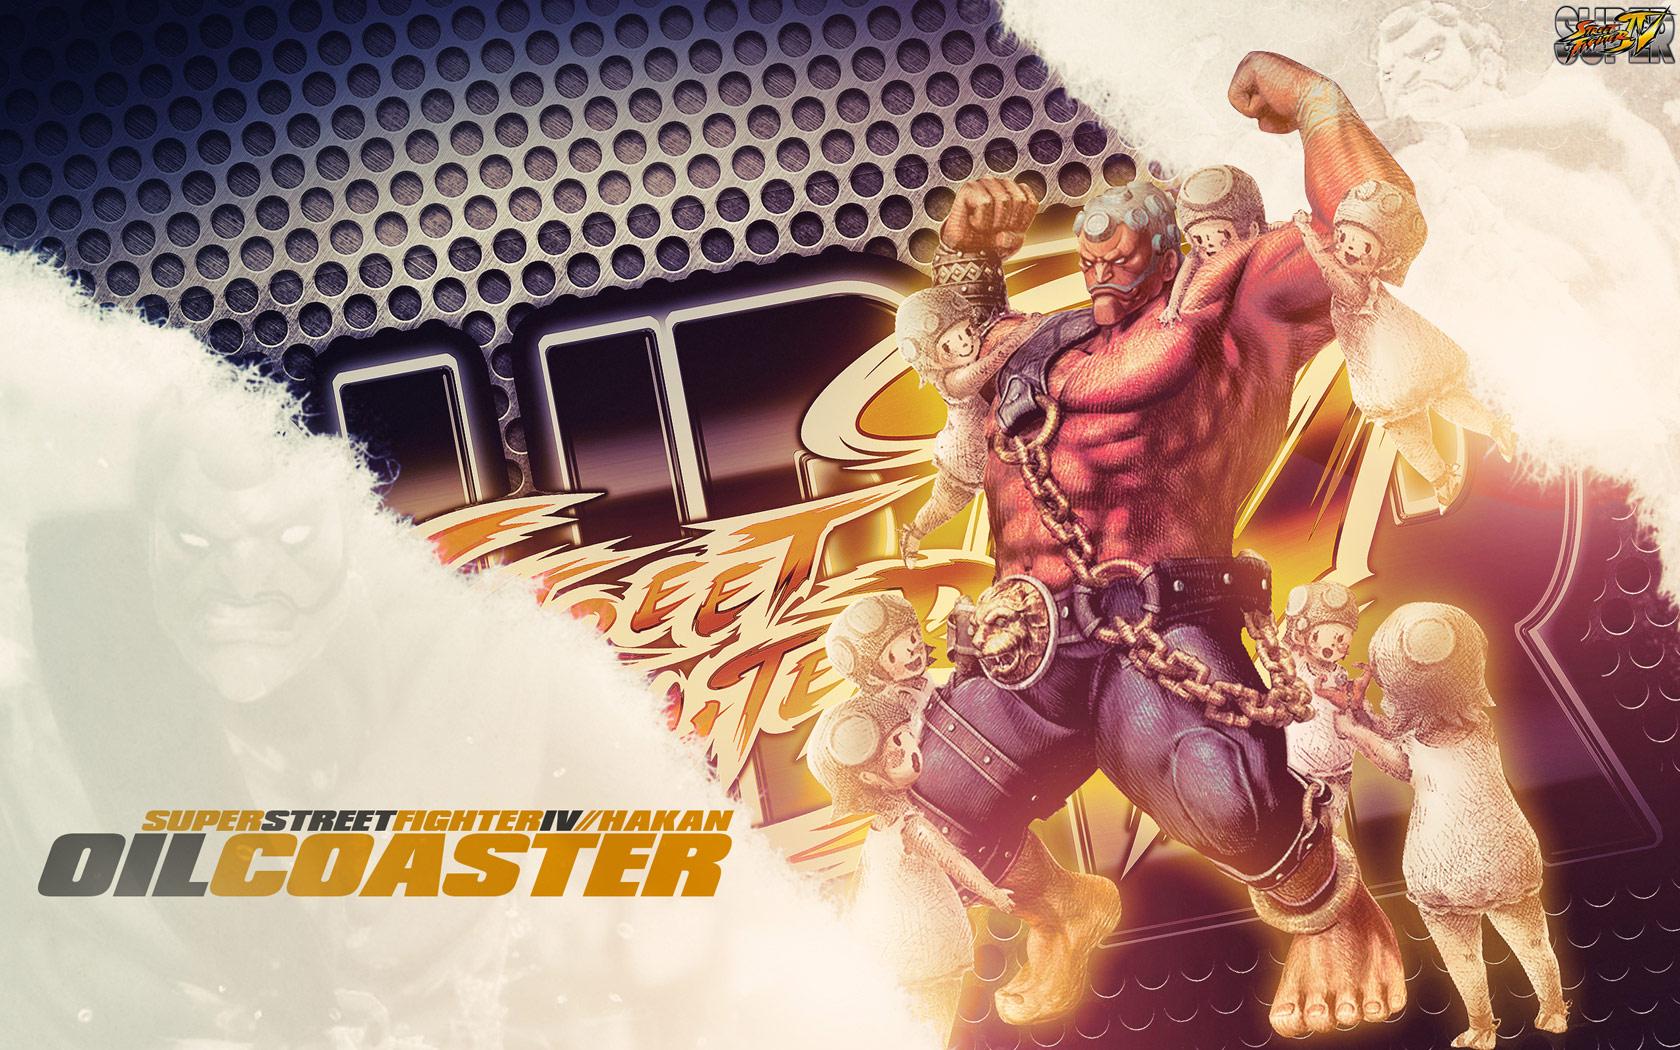 Hakan Super Street Fighter 4 wallpaper by BossLogic